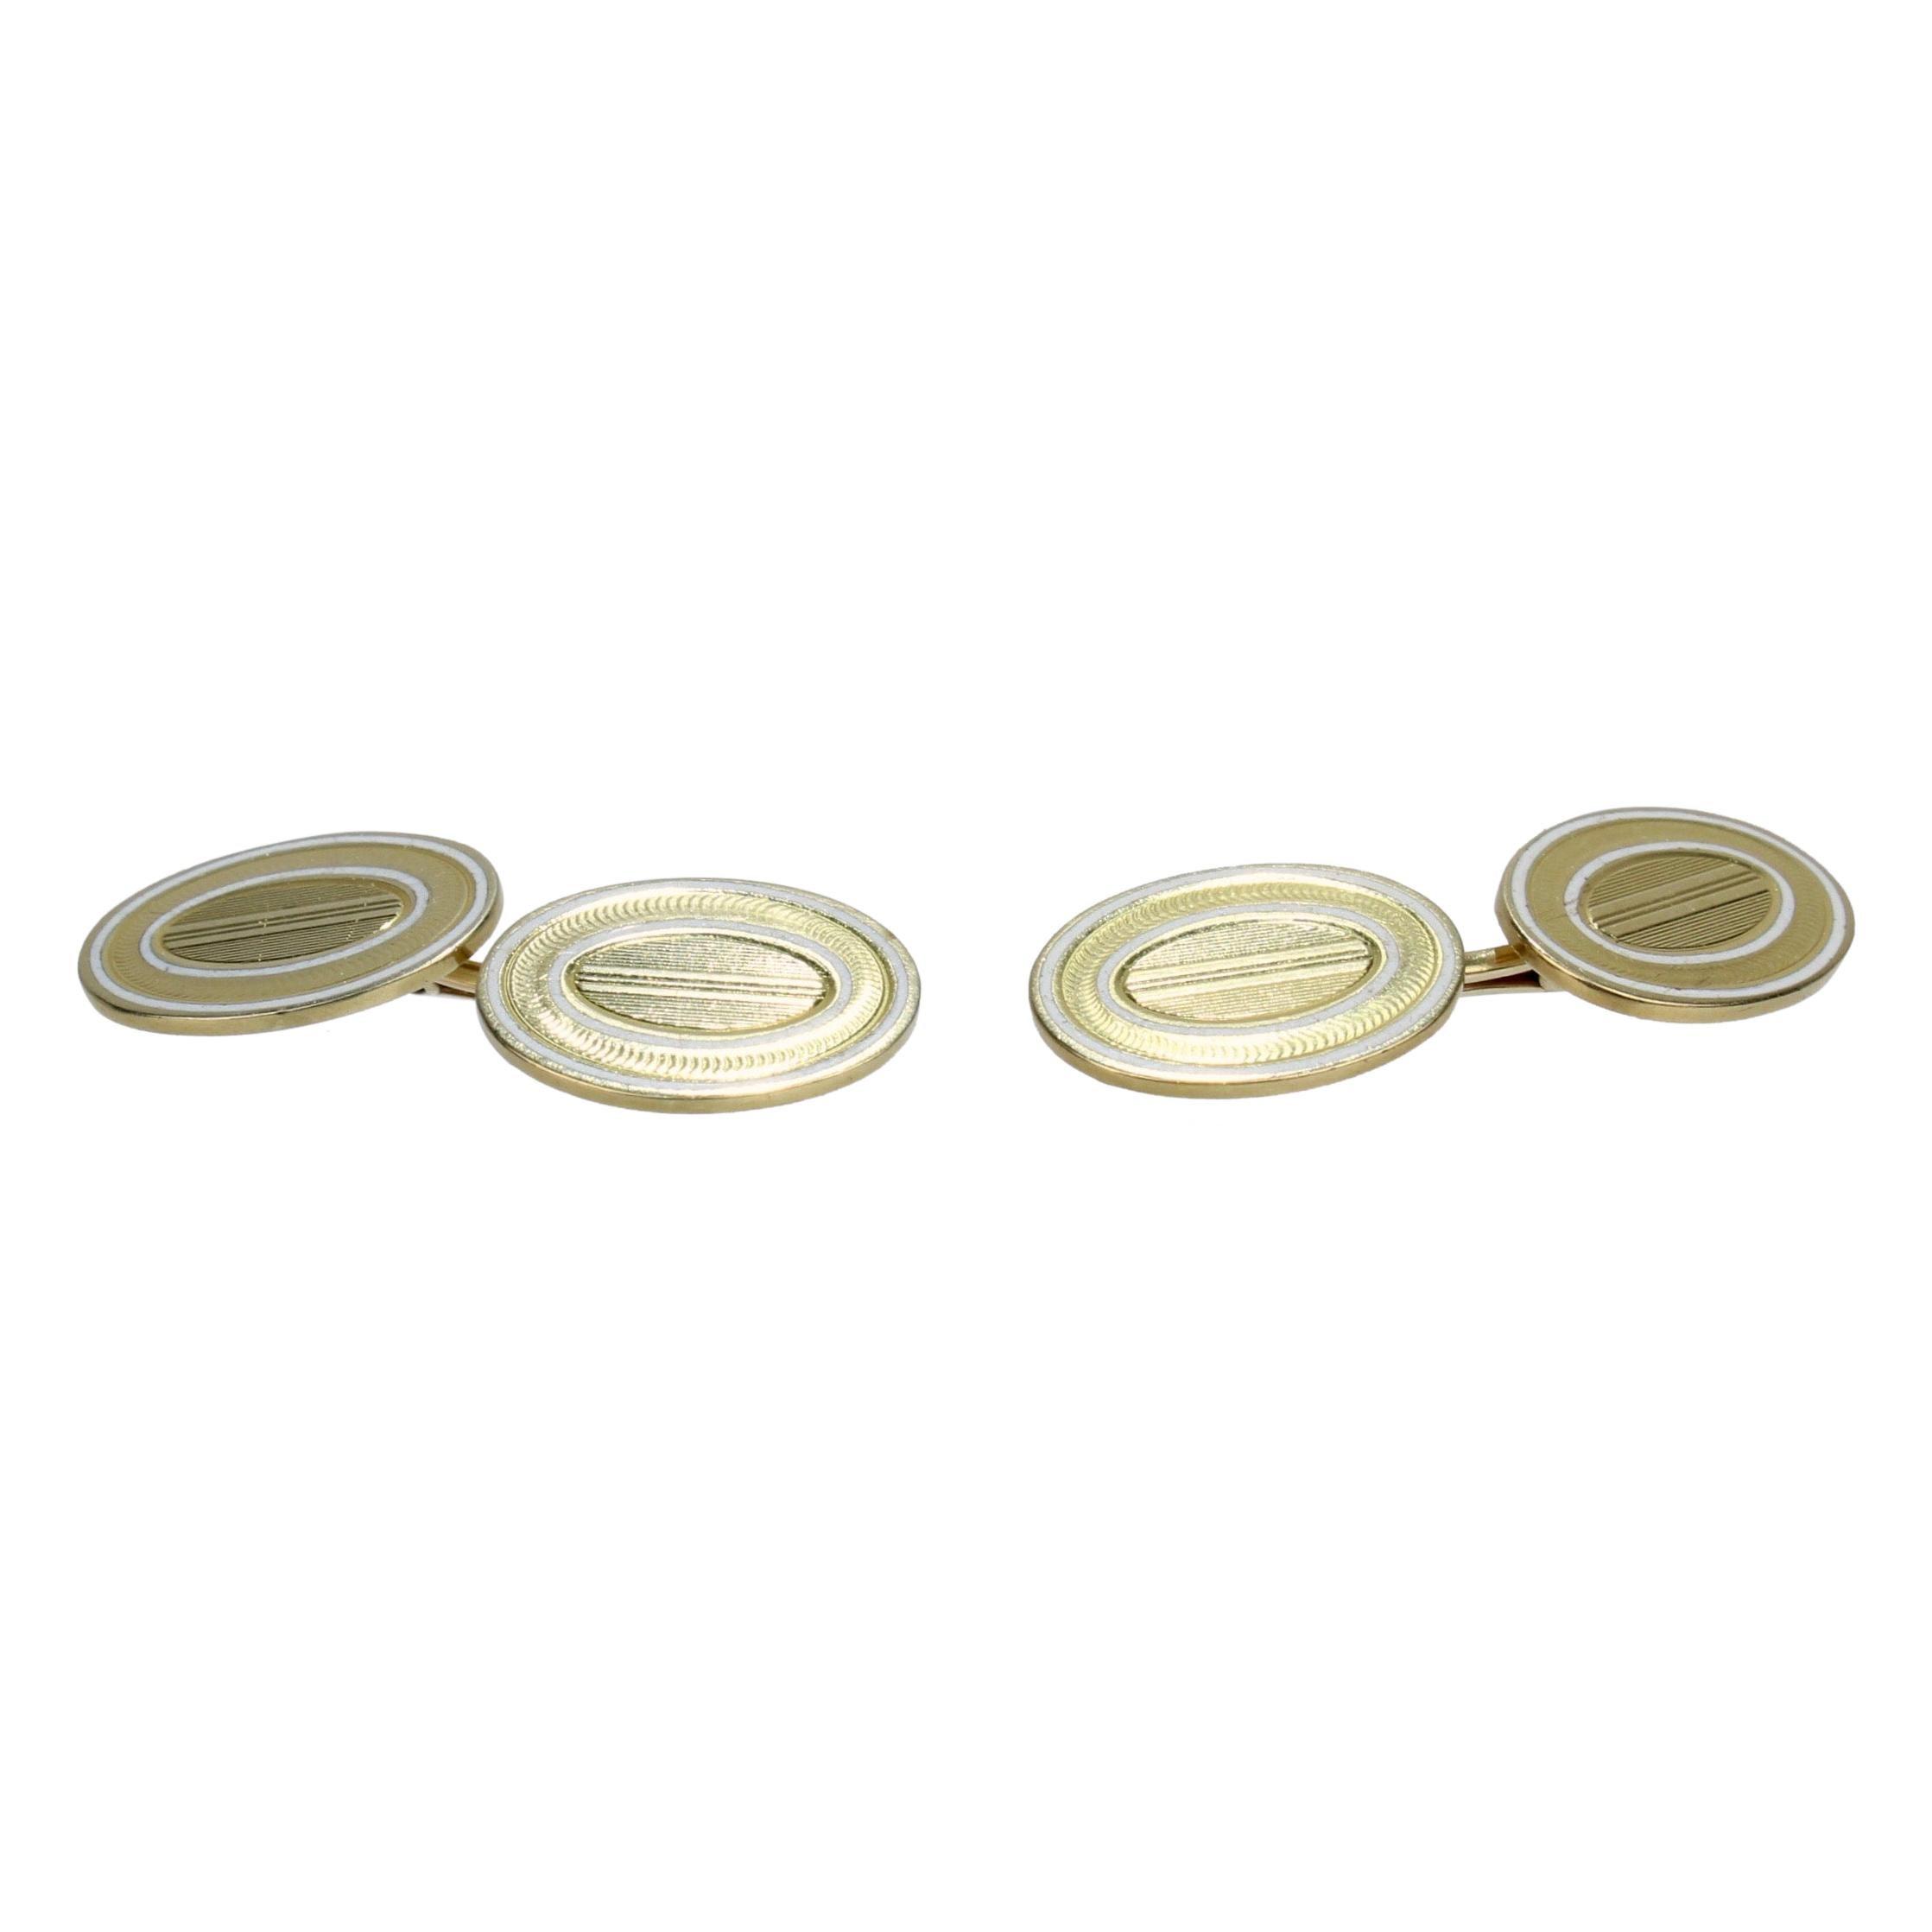 Edwardian 14 Karat and Enamel Oval Cufflinks by Carrington & Co.